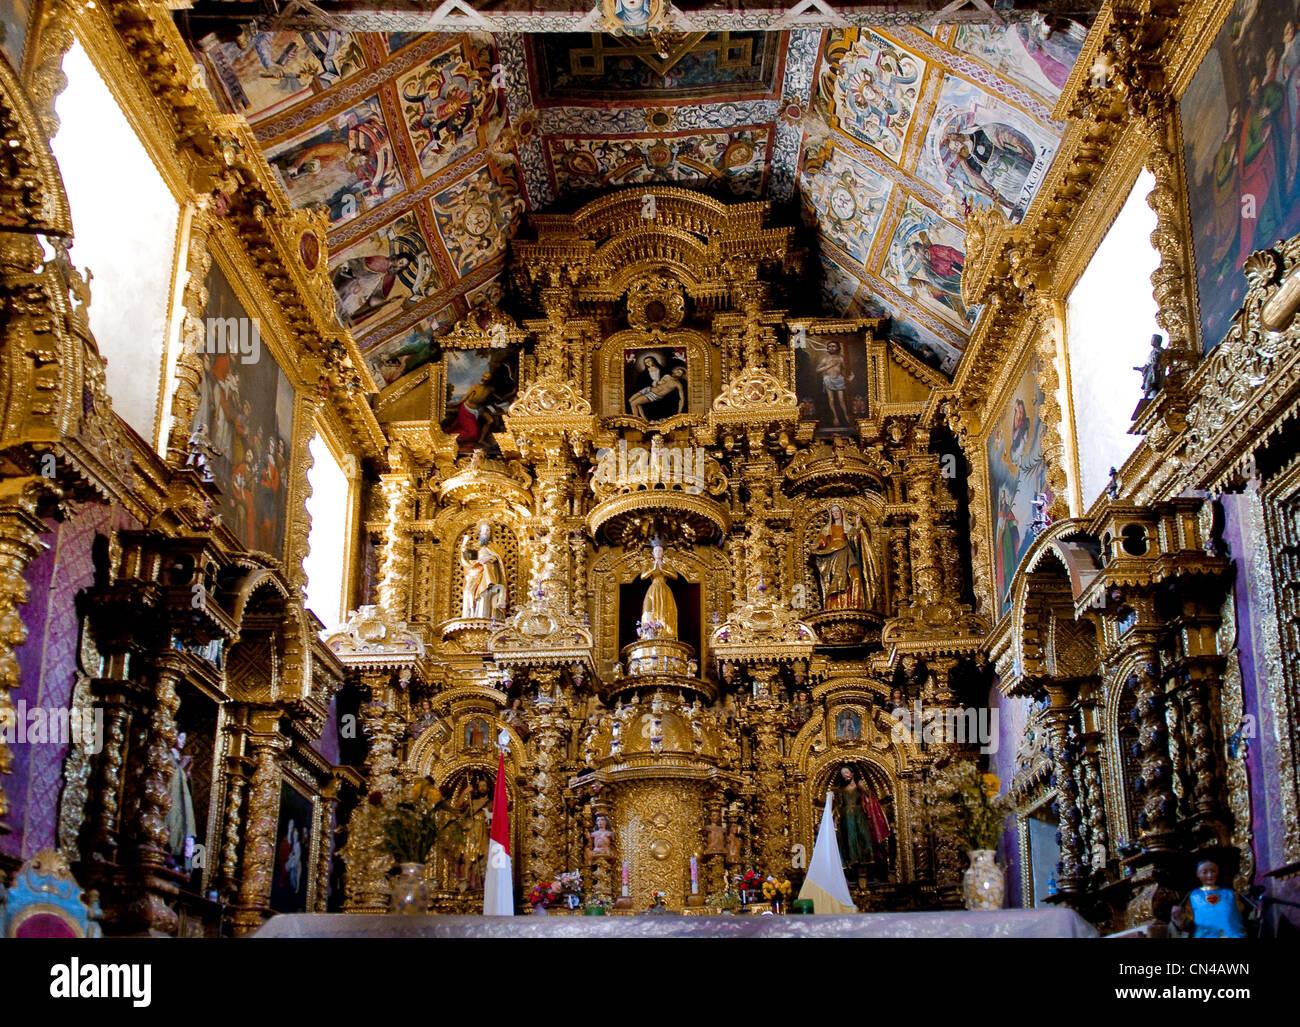 Peru, Cuzco Province, Checacupe, 17th century Baroque ...